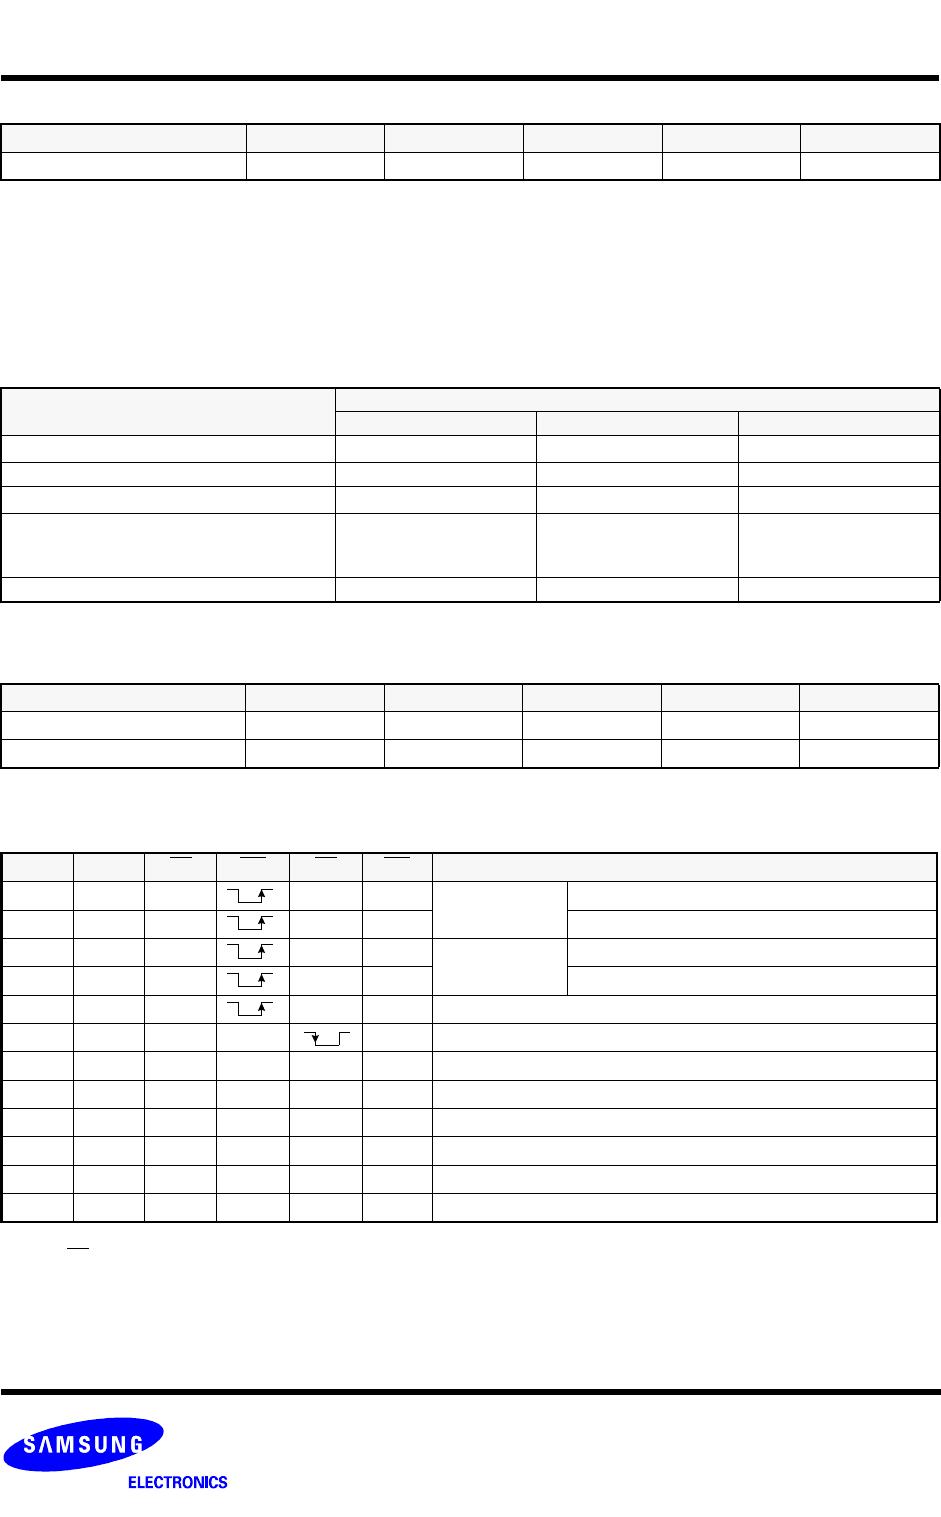 ��f��k9ge�f�x�_k9f1208x0c pdf下载及第11页内容在线浏览